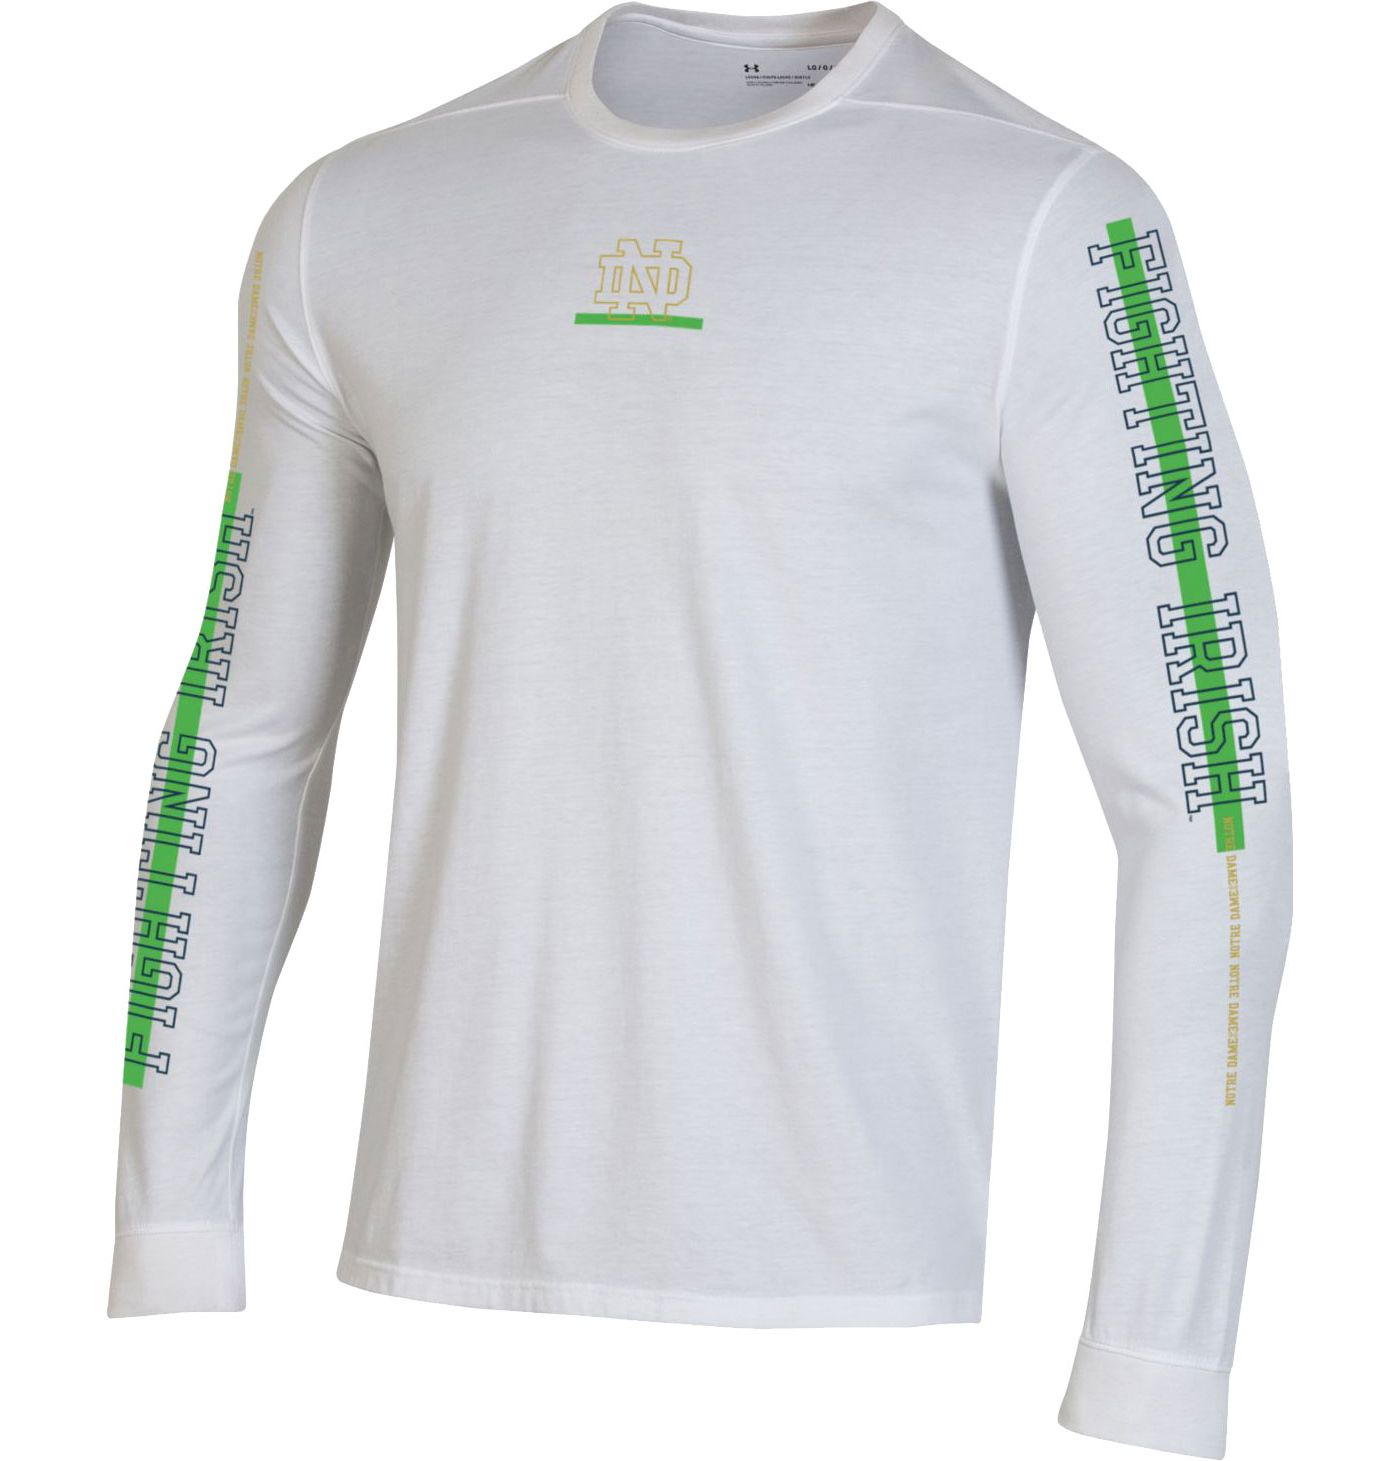 Under Armour Men's Notre Dame Fighting Irish Hype On-Court Long Sleeve Basketball White T-Shirt